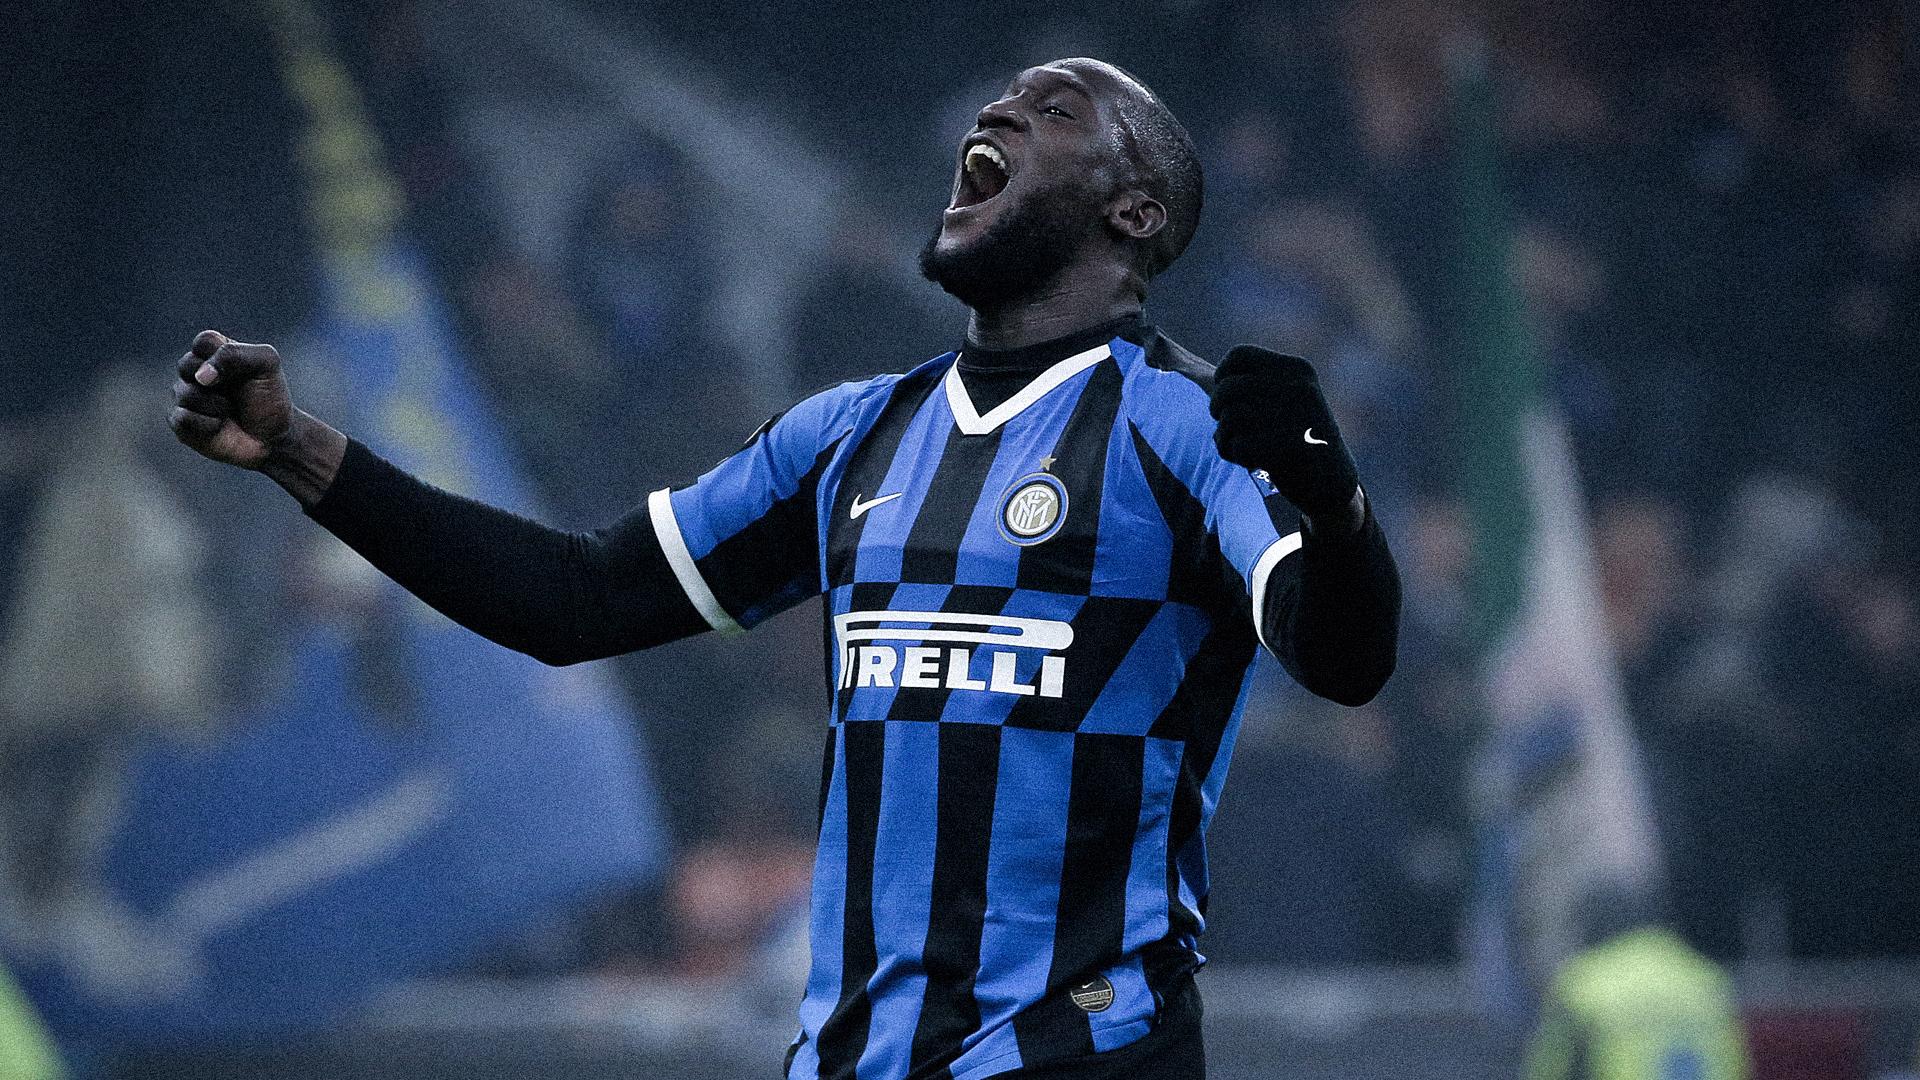 Mismanaged At Manchester United Romelu Lukaku Is Thriving At Inter Milan